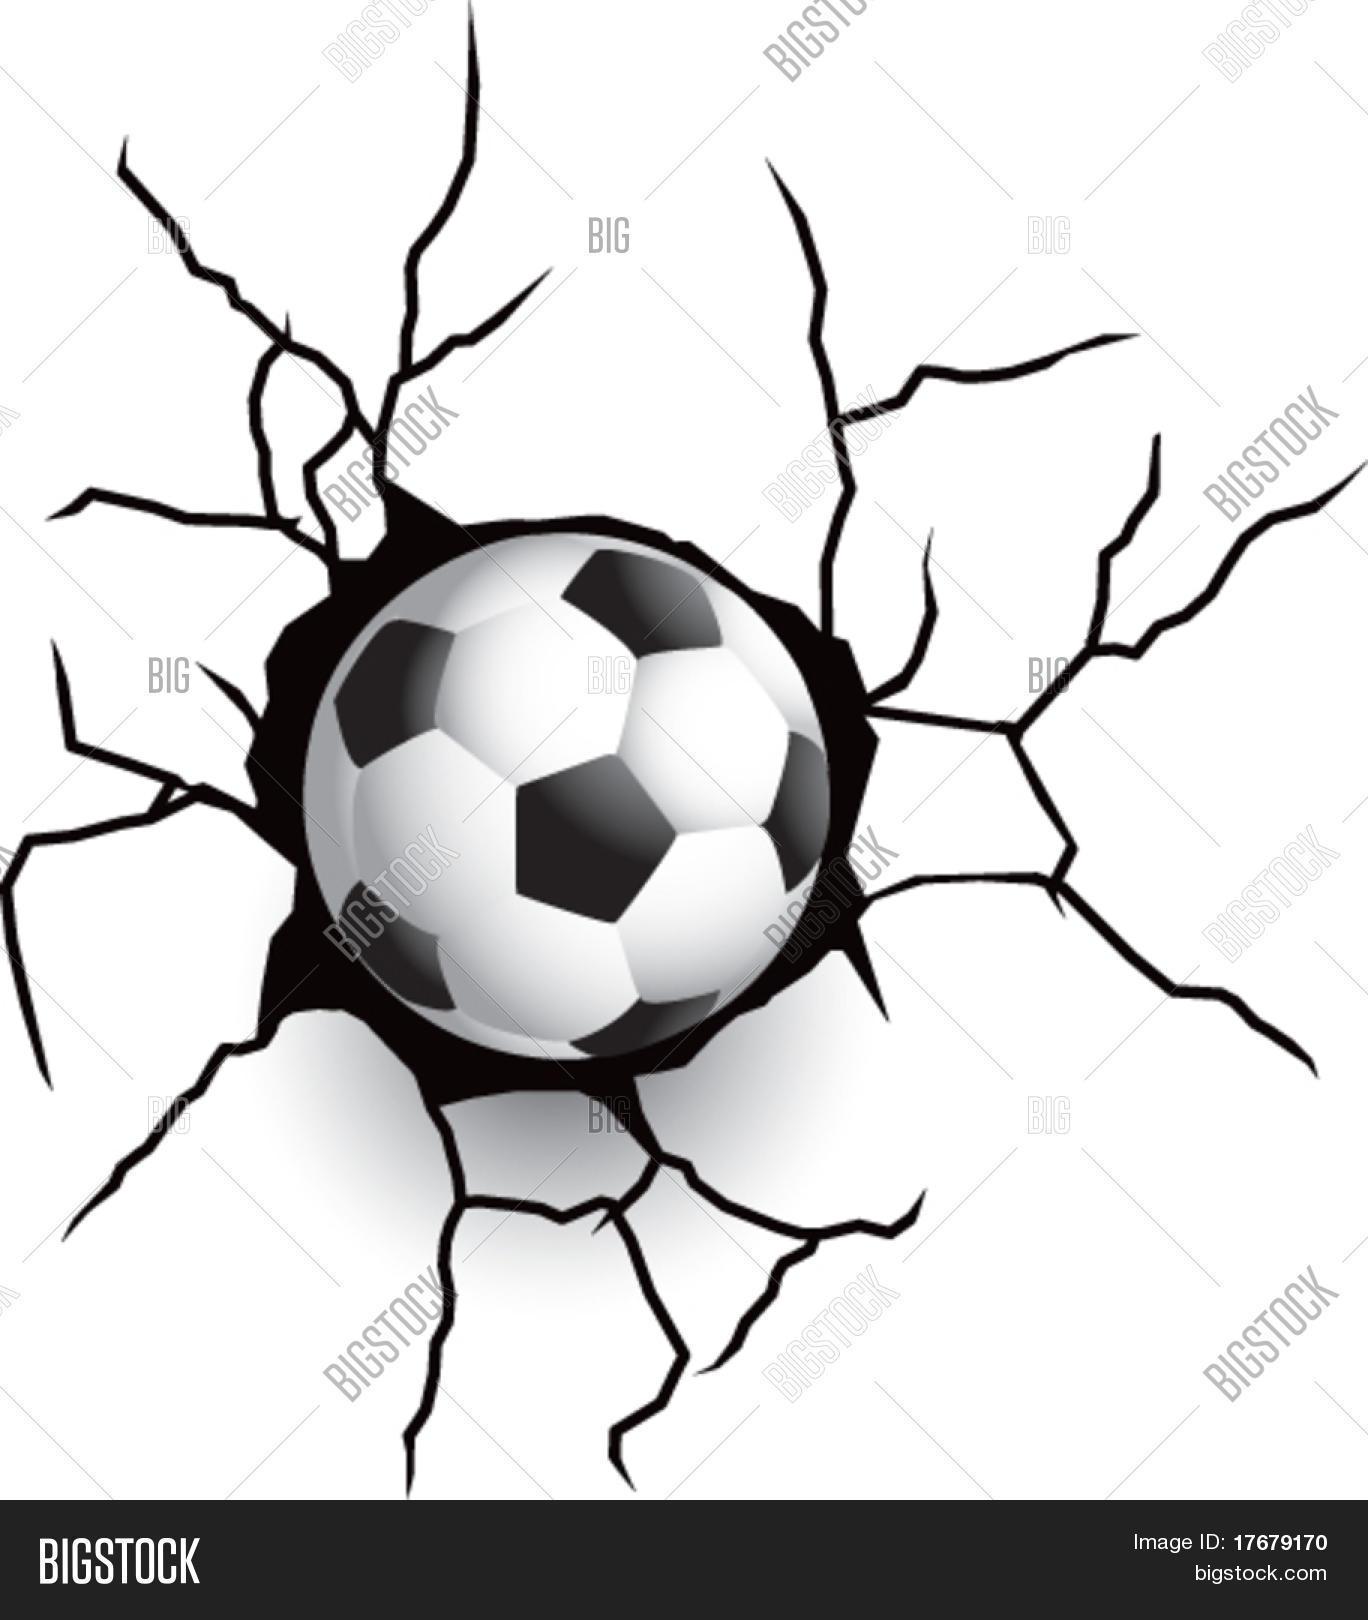 1368x1620 Broken Wall Soccer Football Vector Amp Photo Bigstock